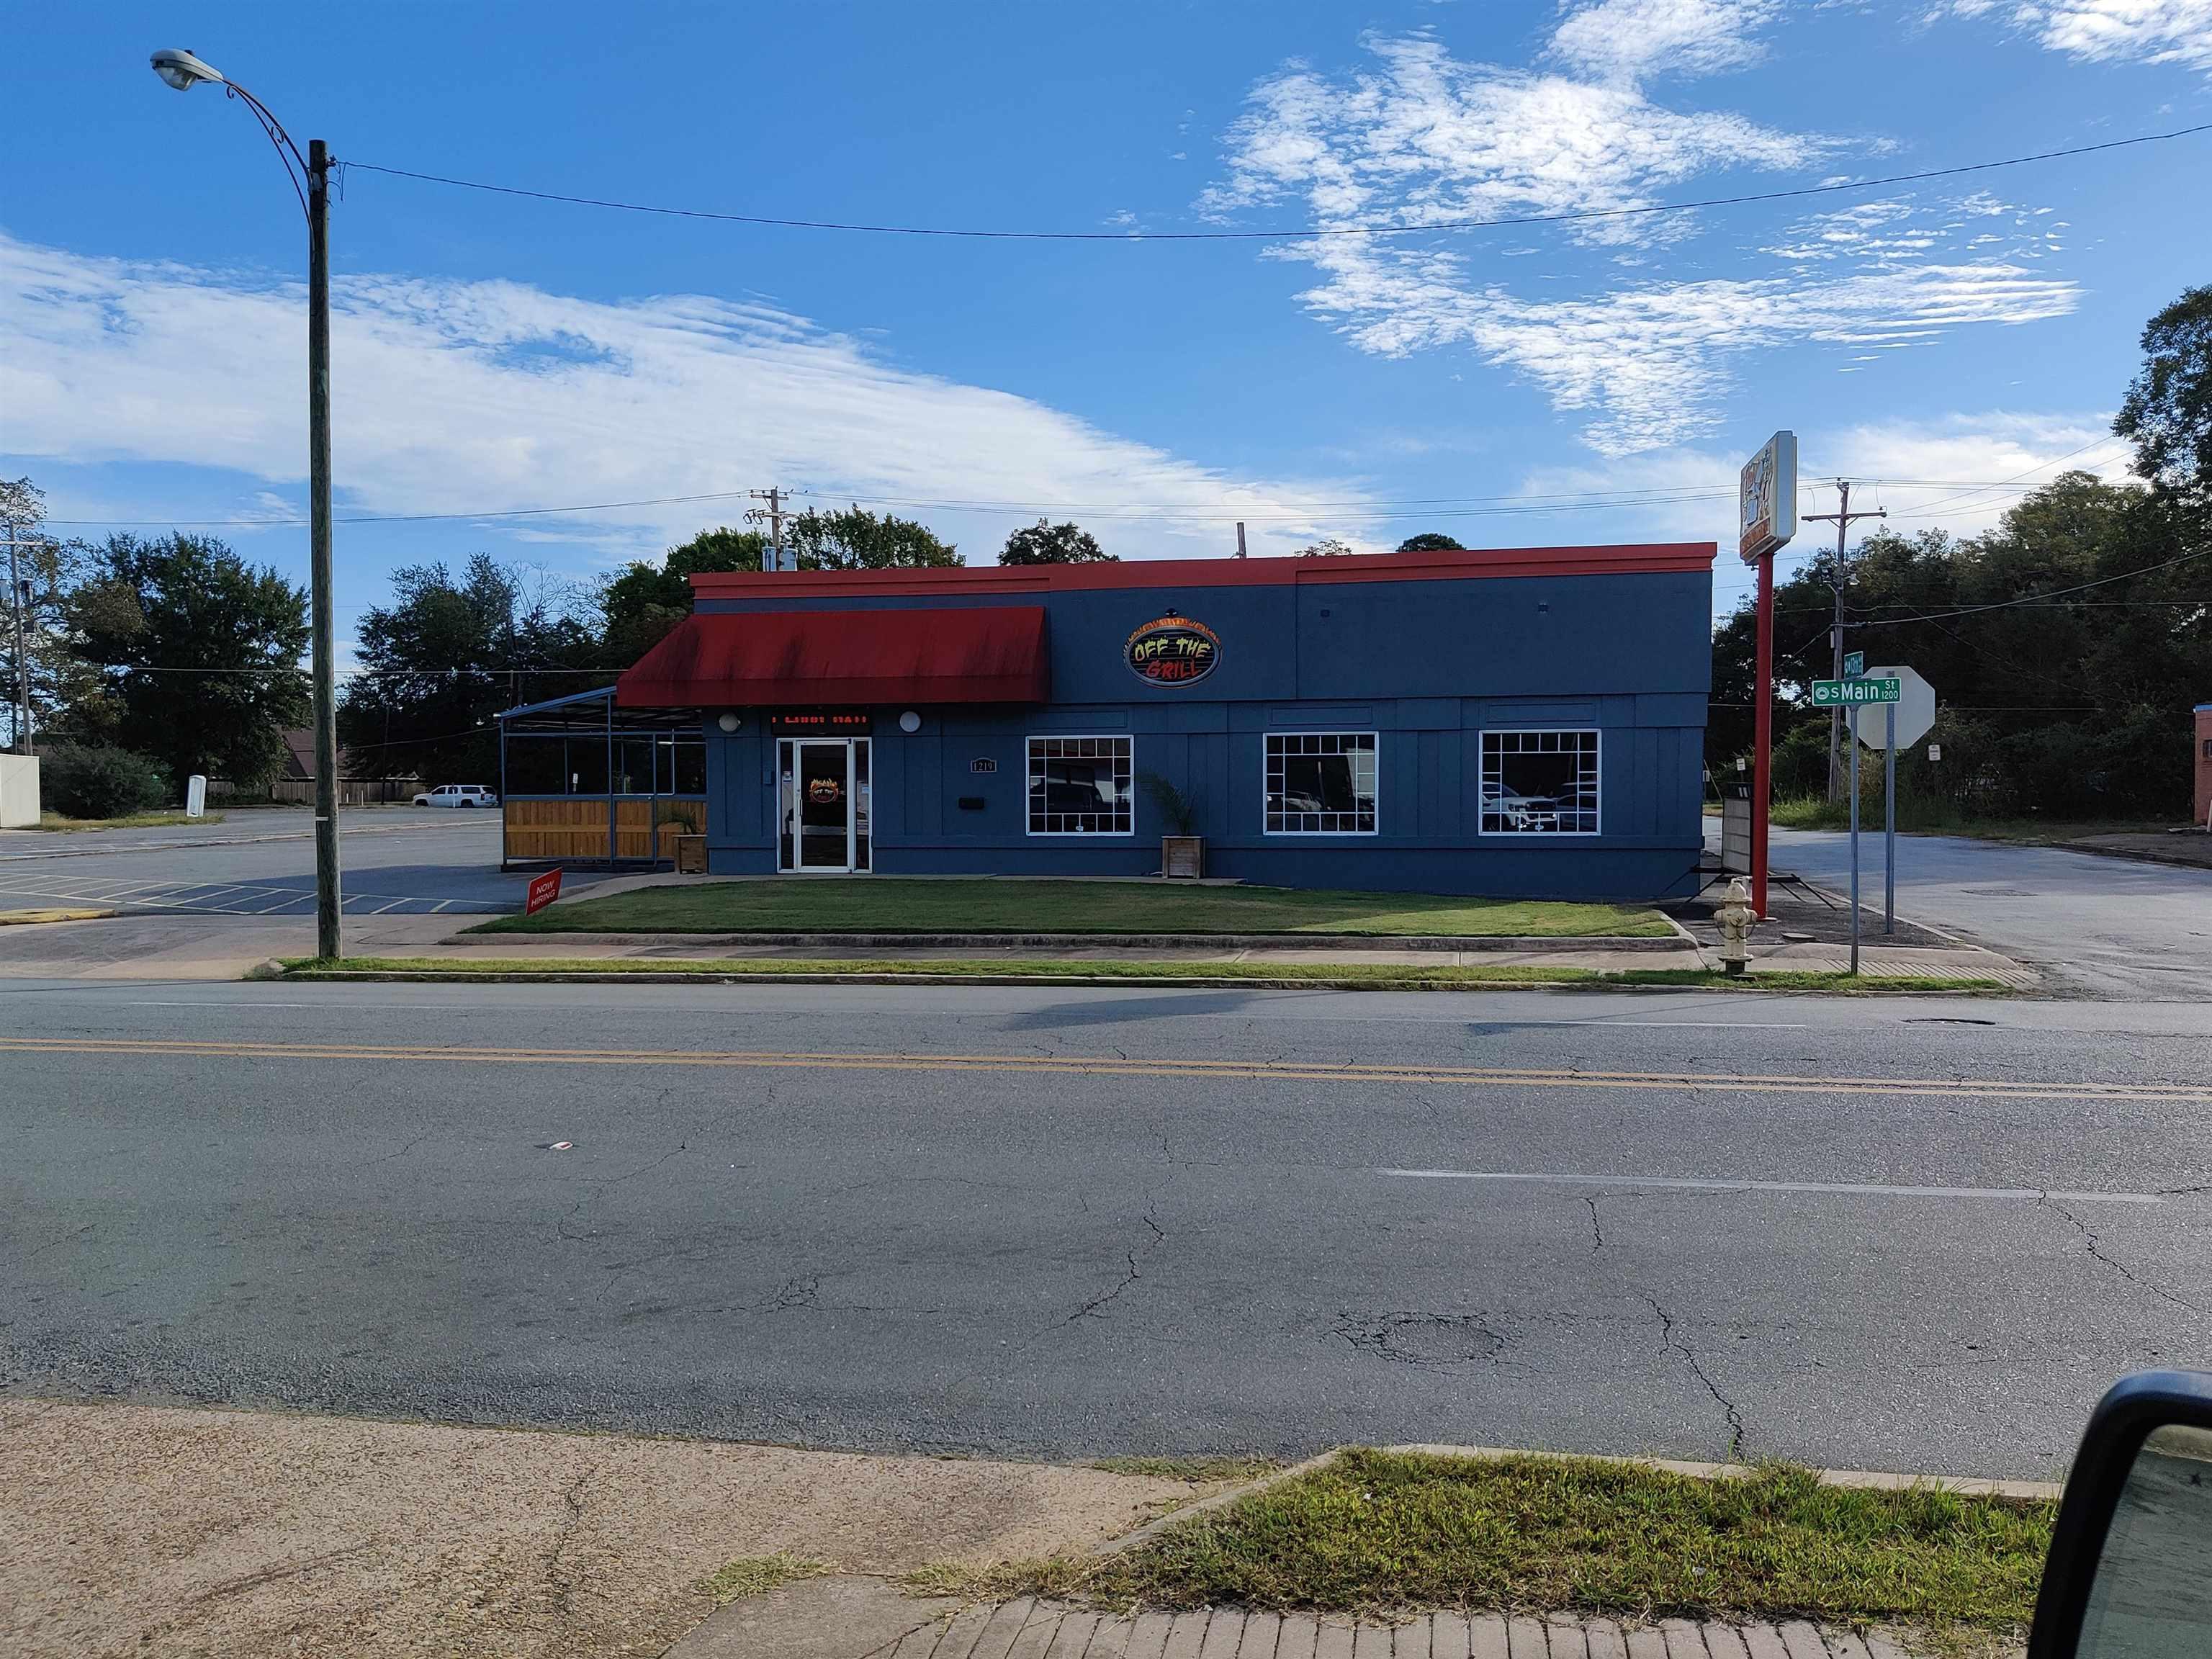 1219 S Main #No, Pine Bluff, AR 71601